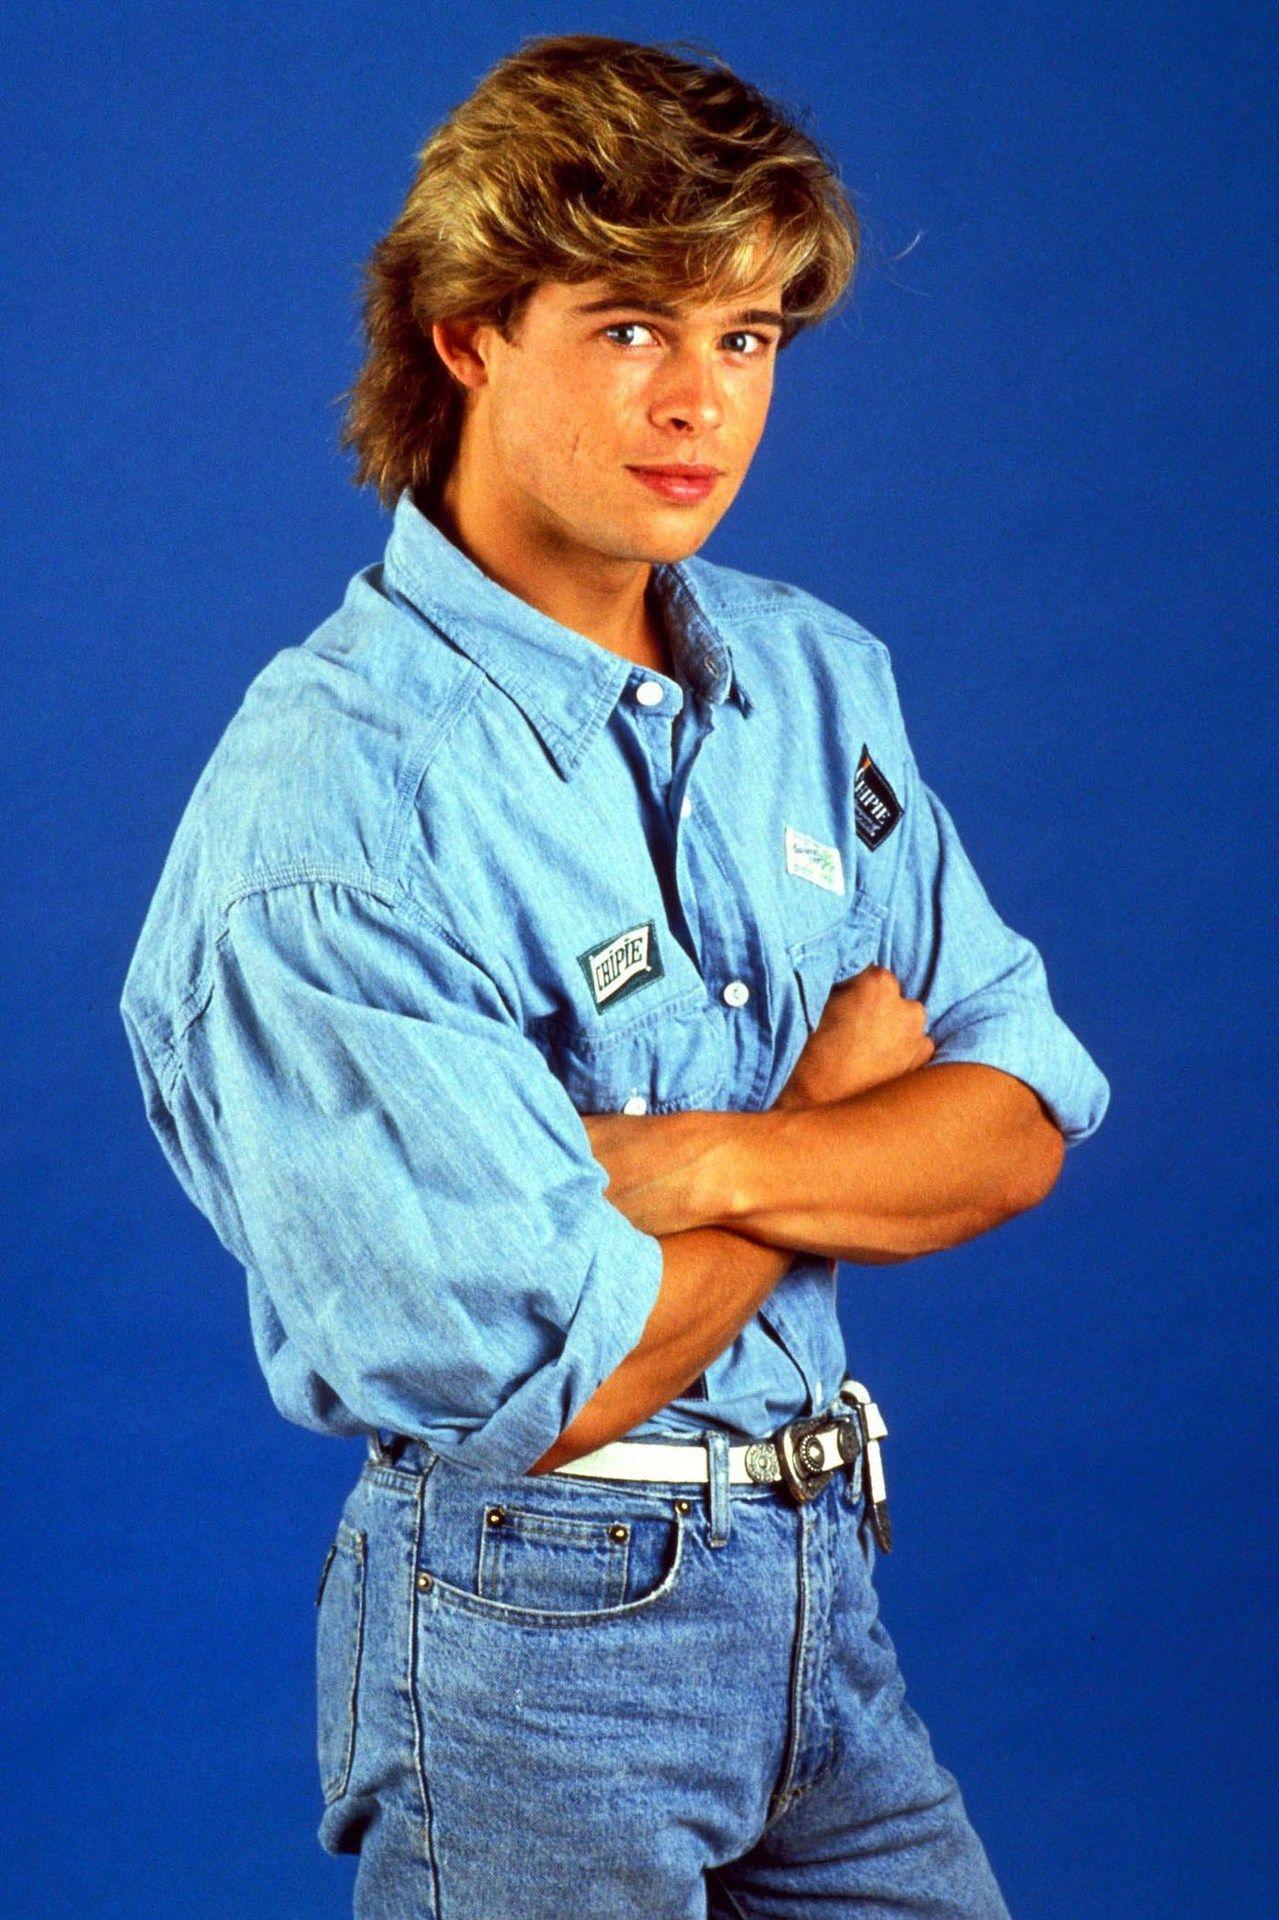 brad pitt 1980's high waist jeans  moda ochentera brad